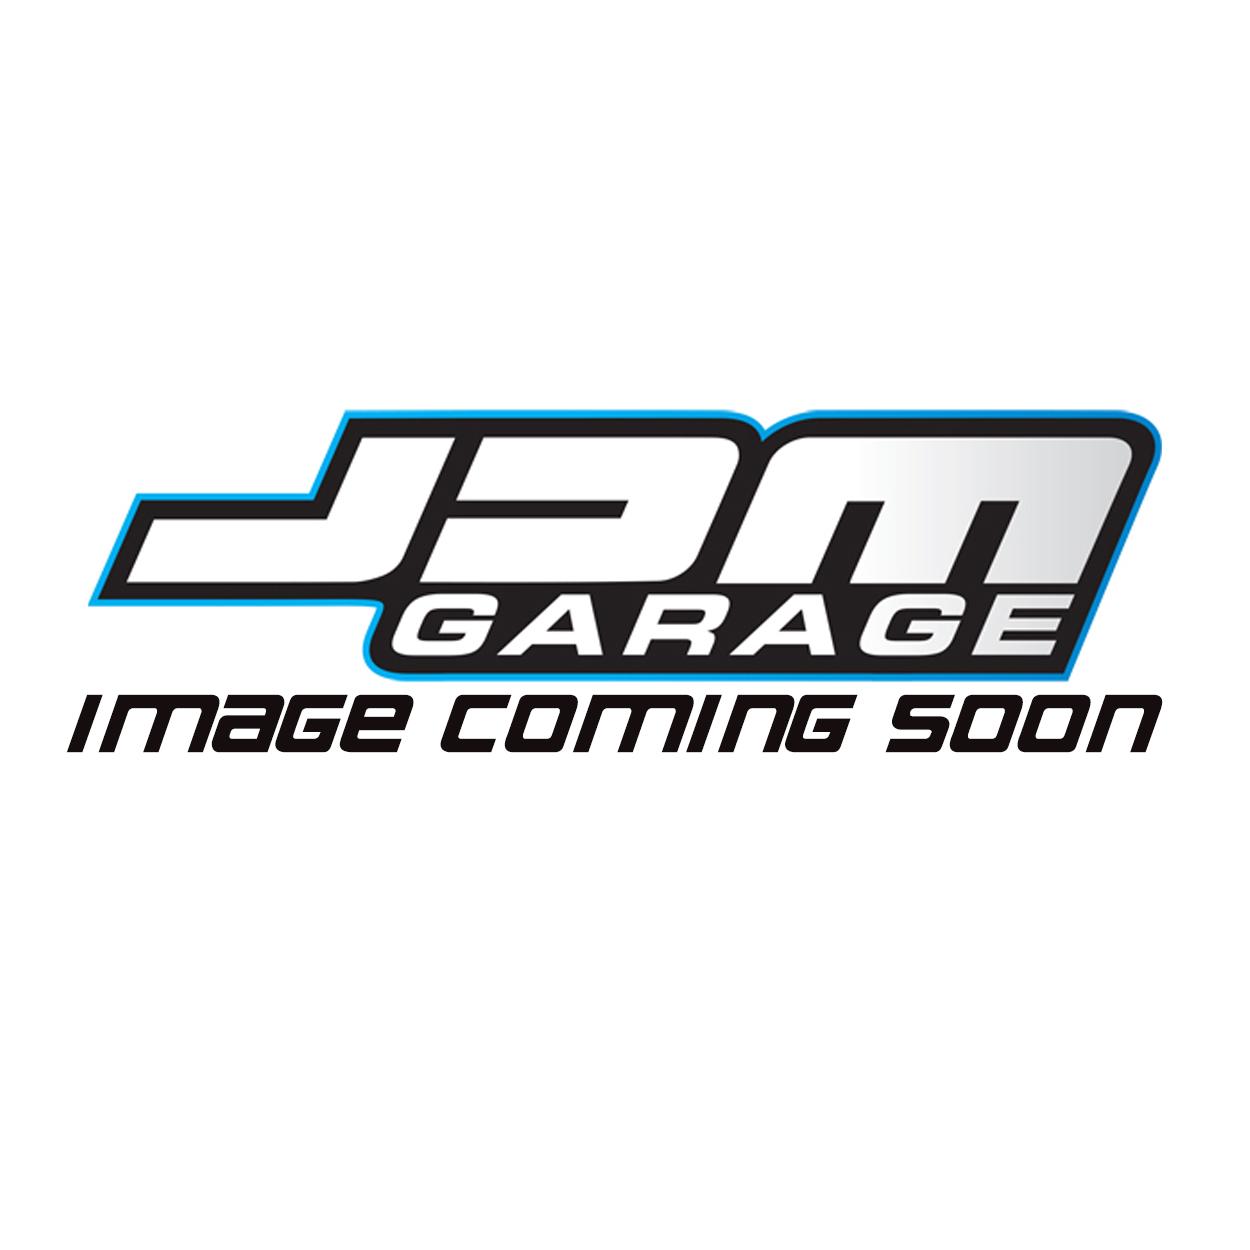 OE Front Caliper Rebuild Seal Kit For Silvia S14 S15 SR20DE Skyline R32 GTS Cefiro A31 RB20DE